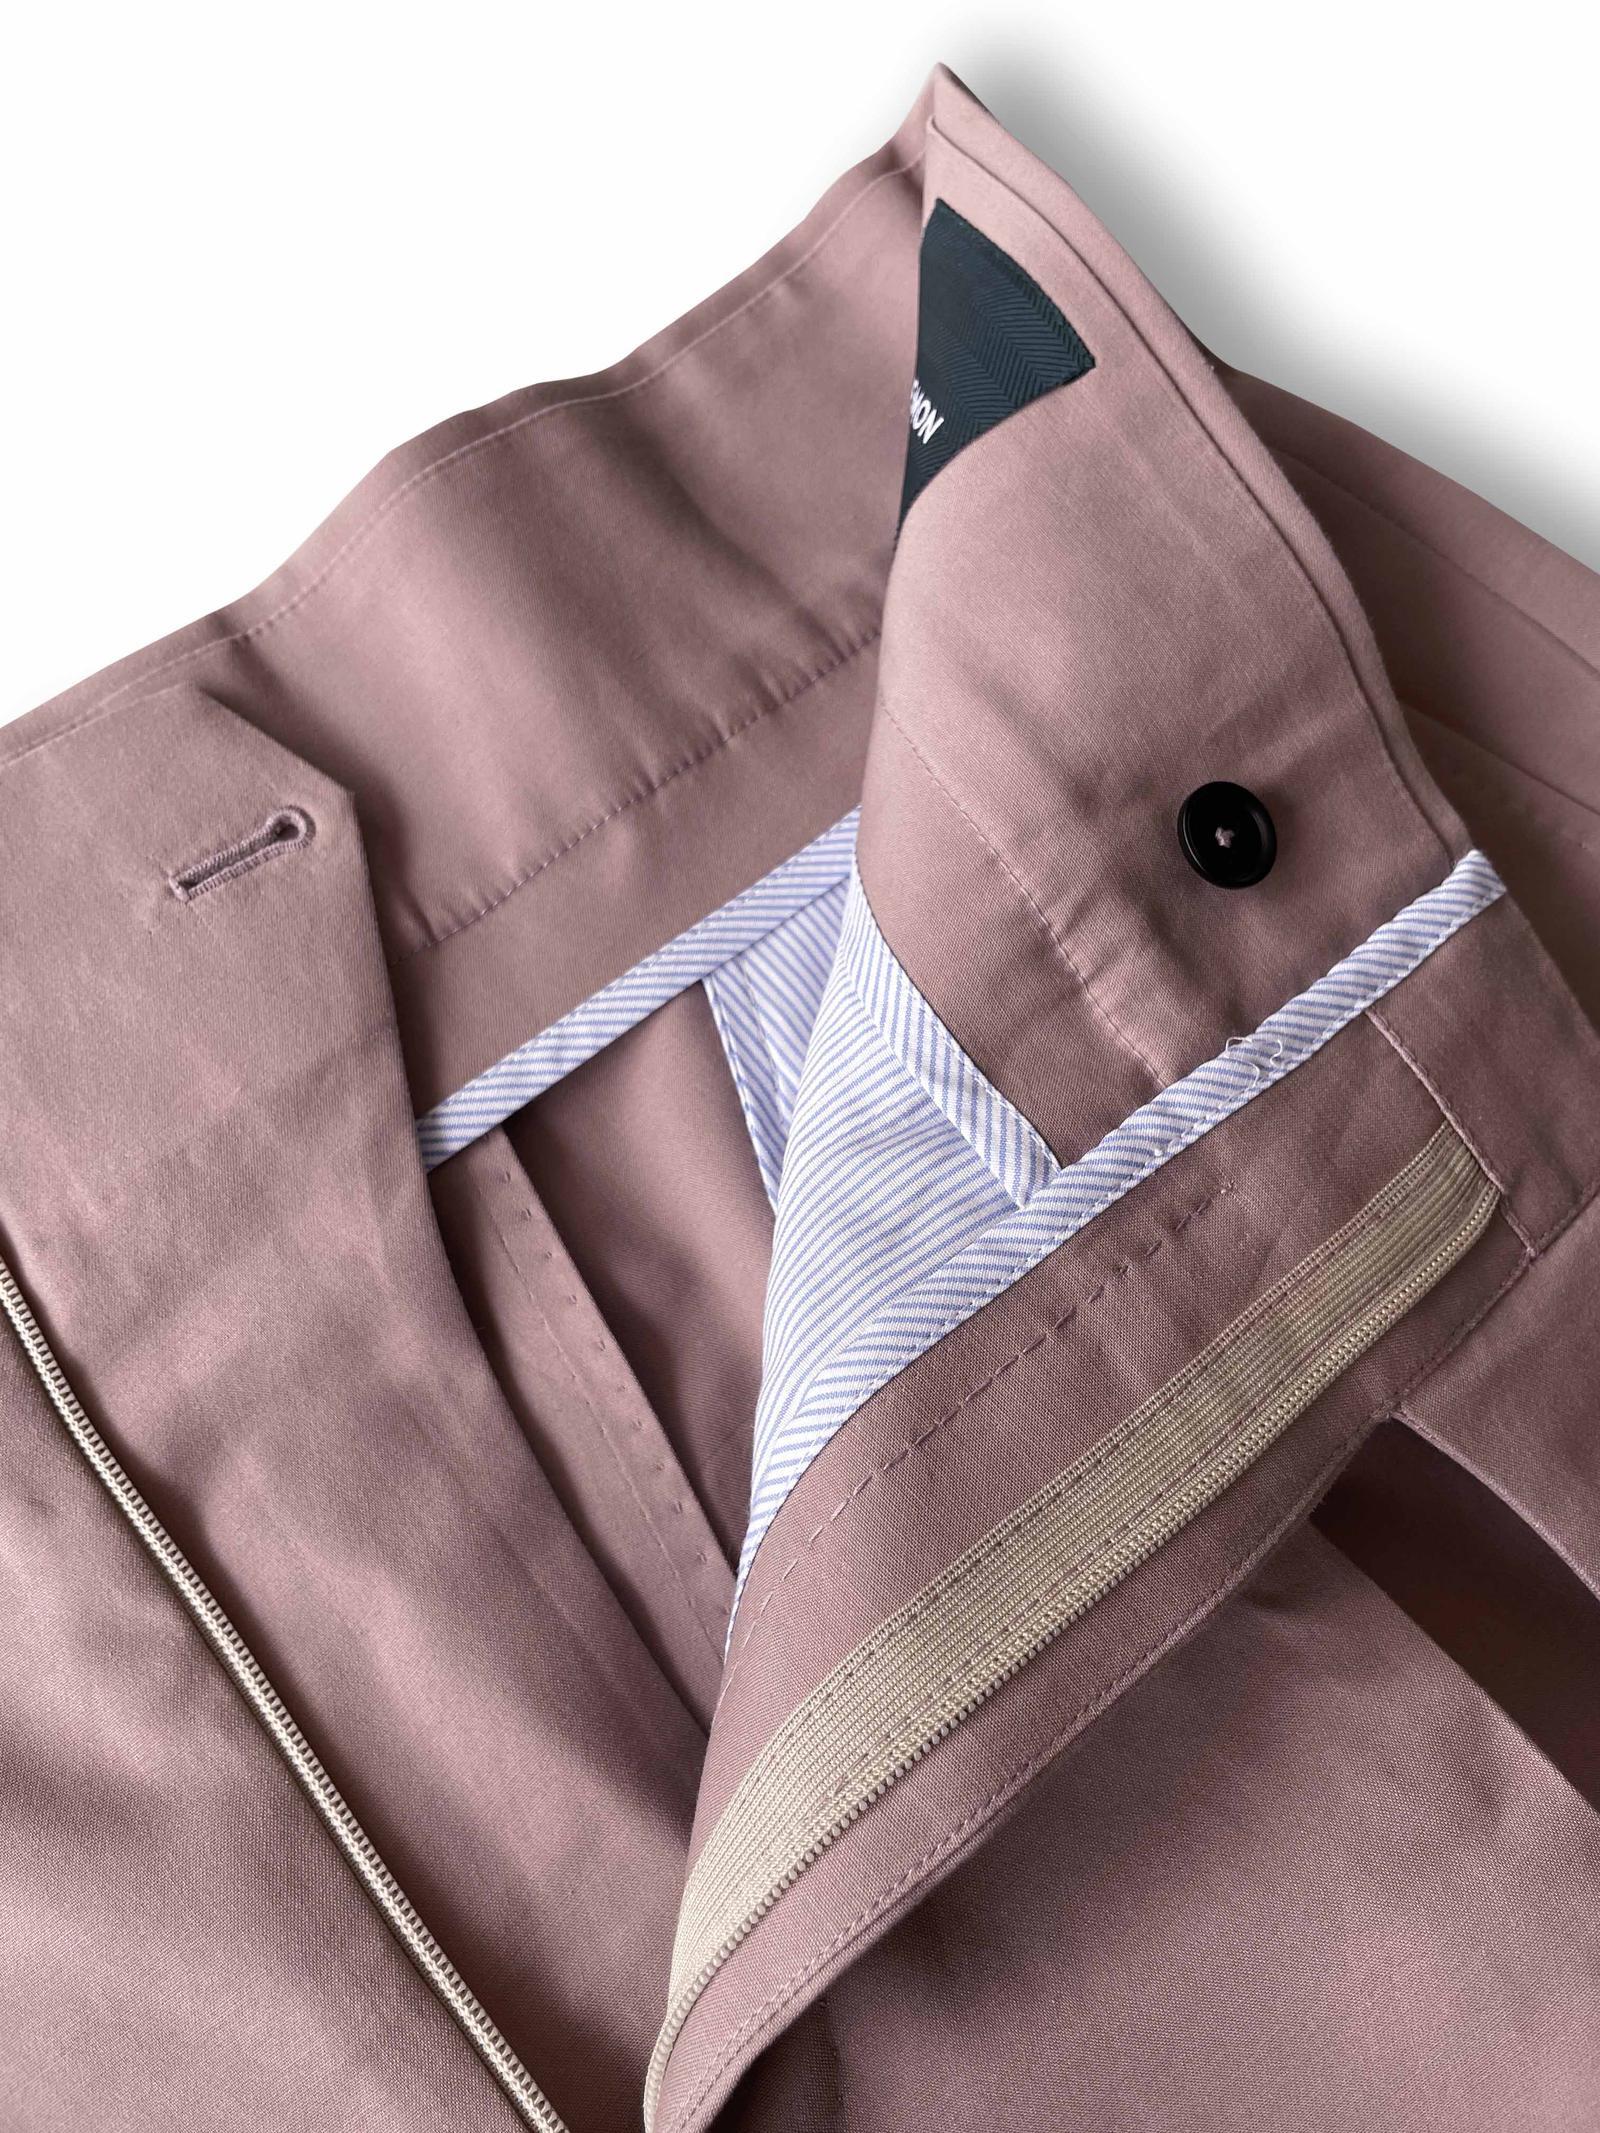 Gurkha Shorts - Mauve Cotton